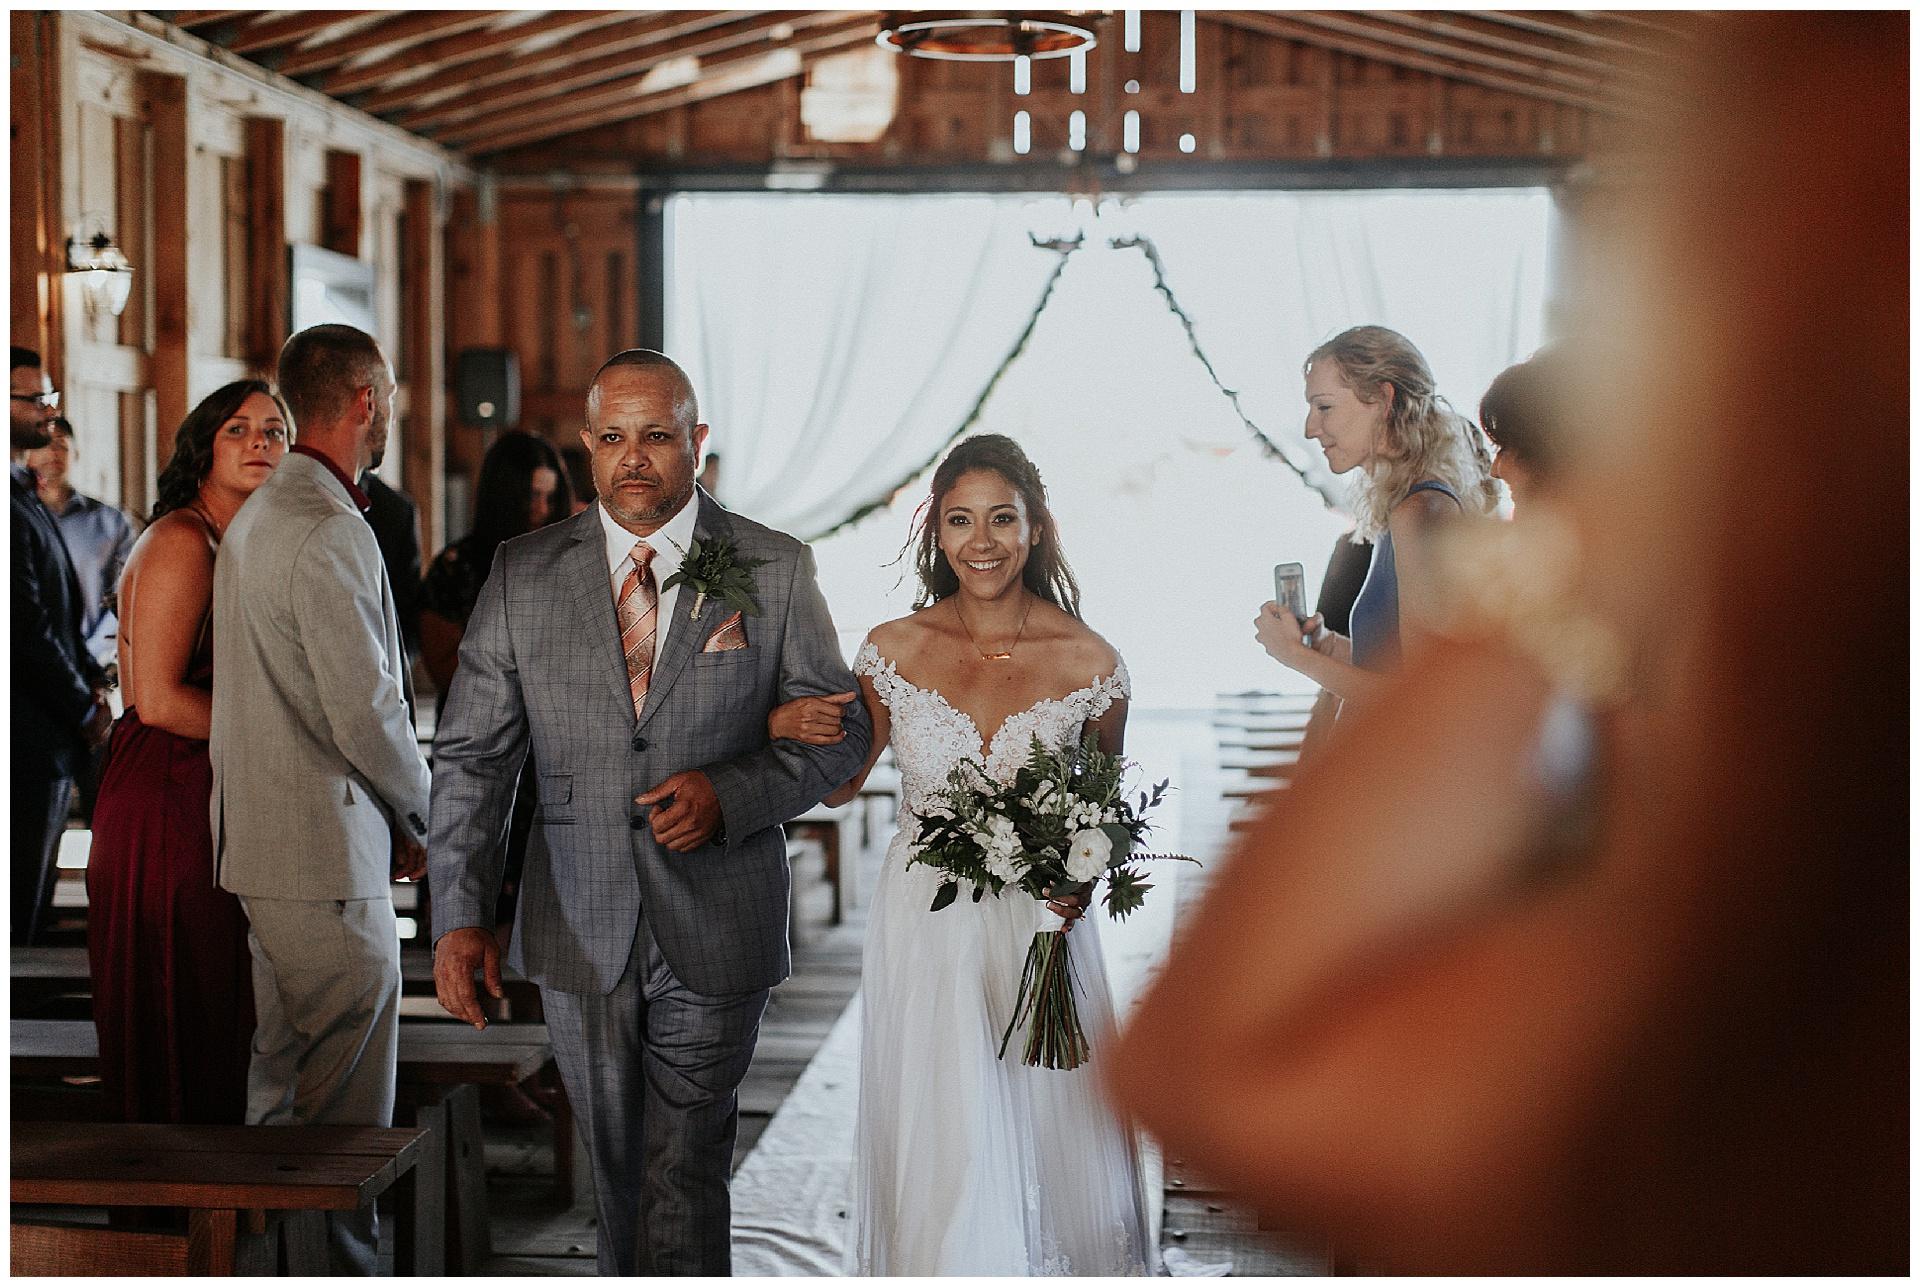 st augustine wedding photographer_mia dimare photography15.jpg